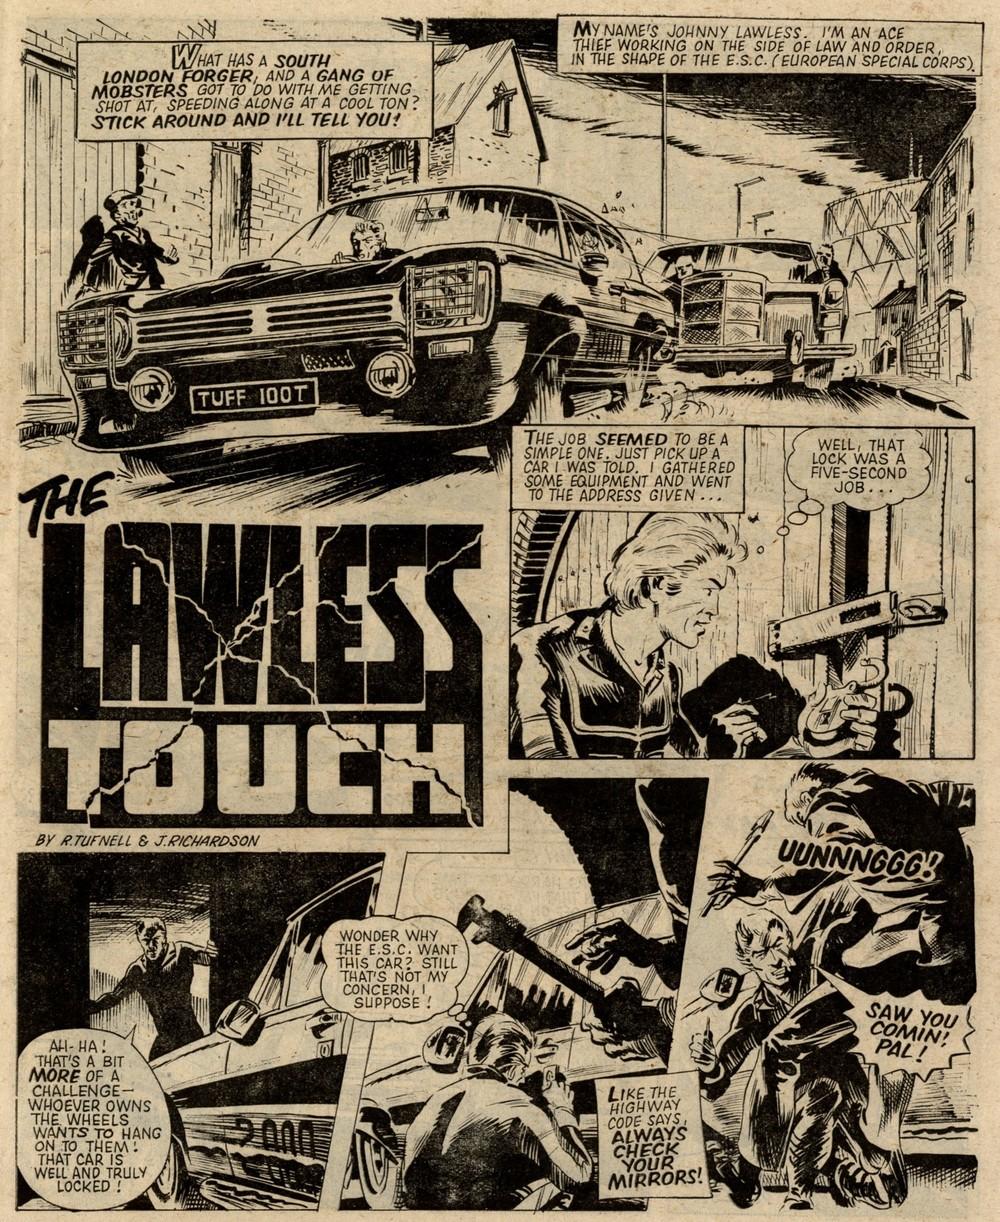 The Lawless Touch: R Tufnell (writer), John Richardson (artist)